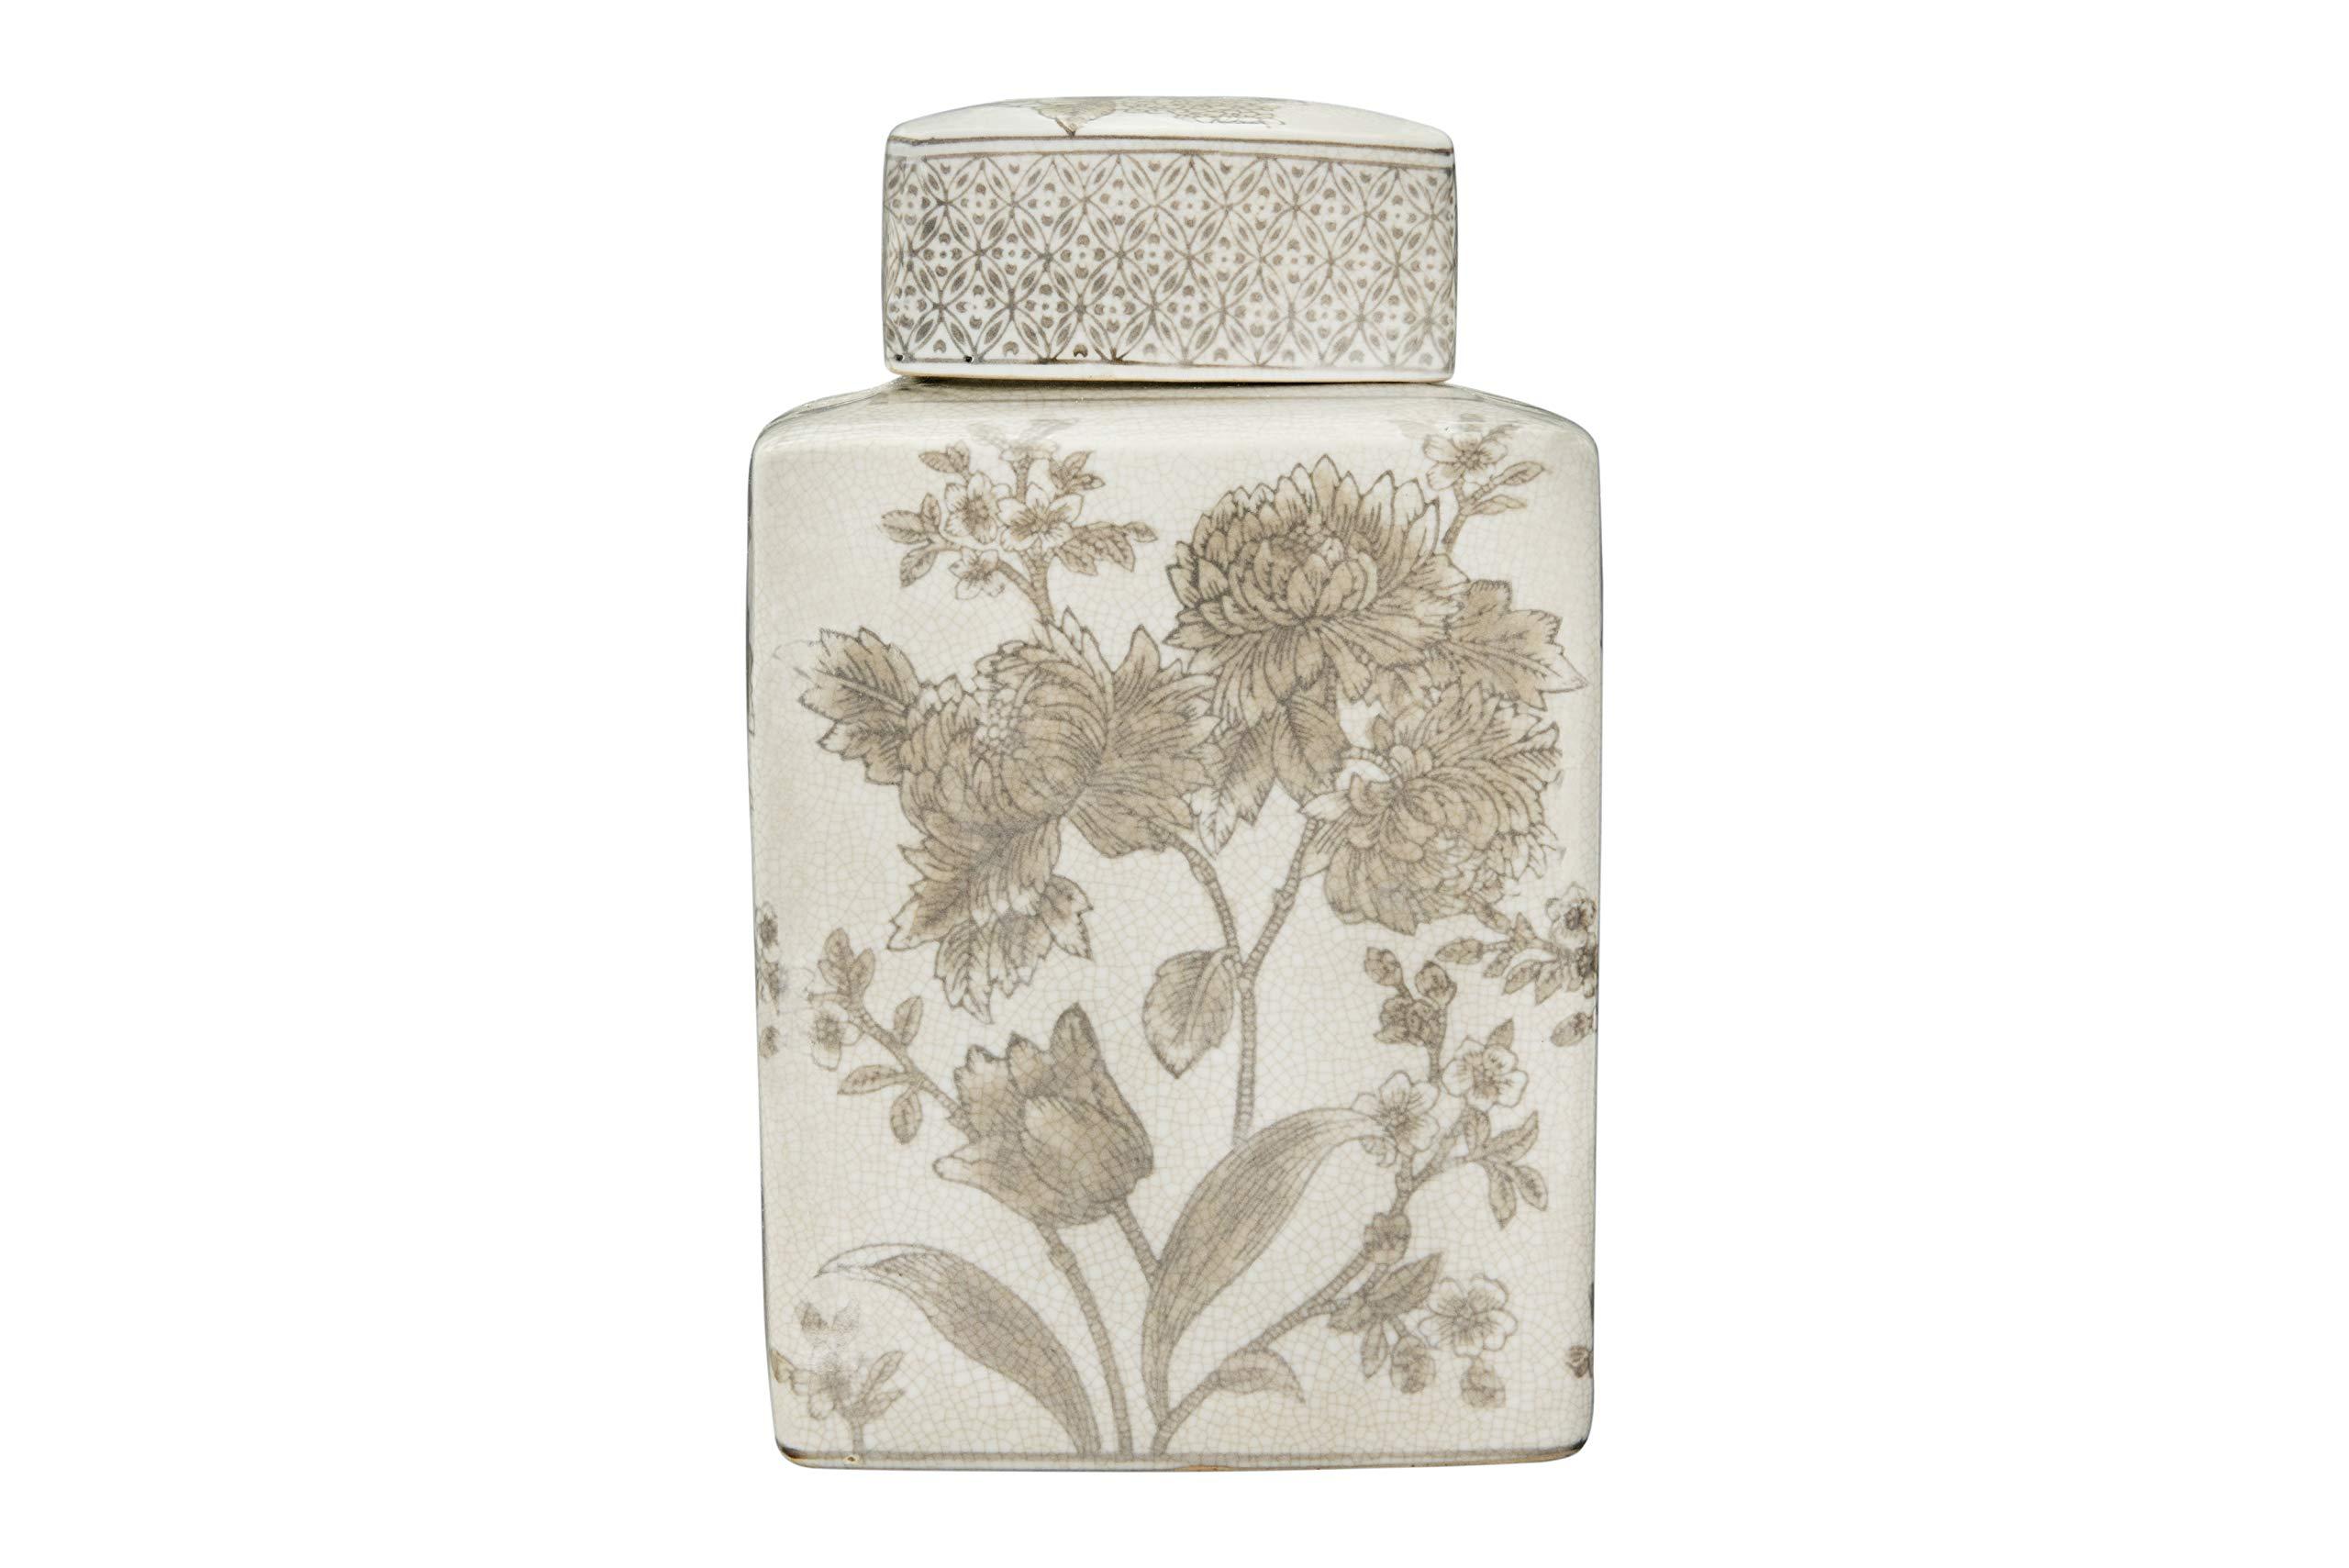 Creative Co-op Large Brown Floral Transferware Stoneware Lid Ginger Jar,